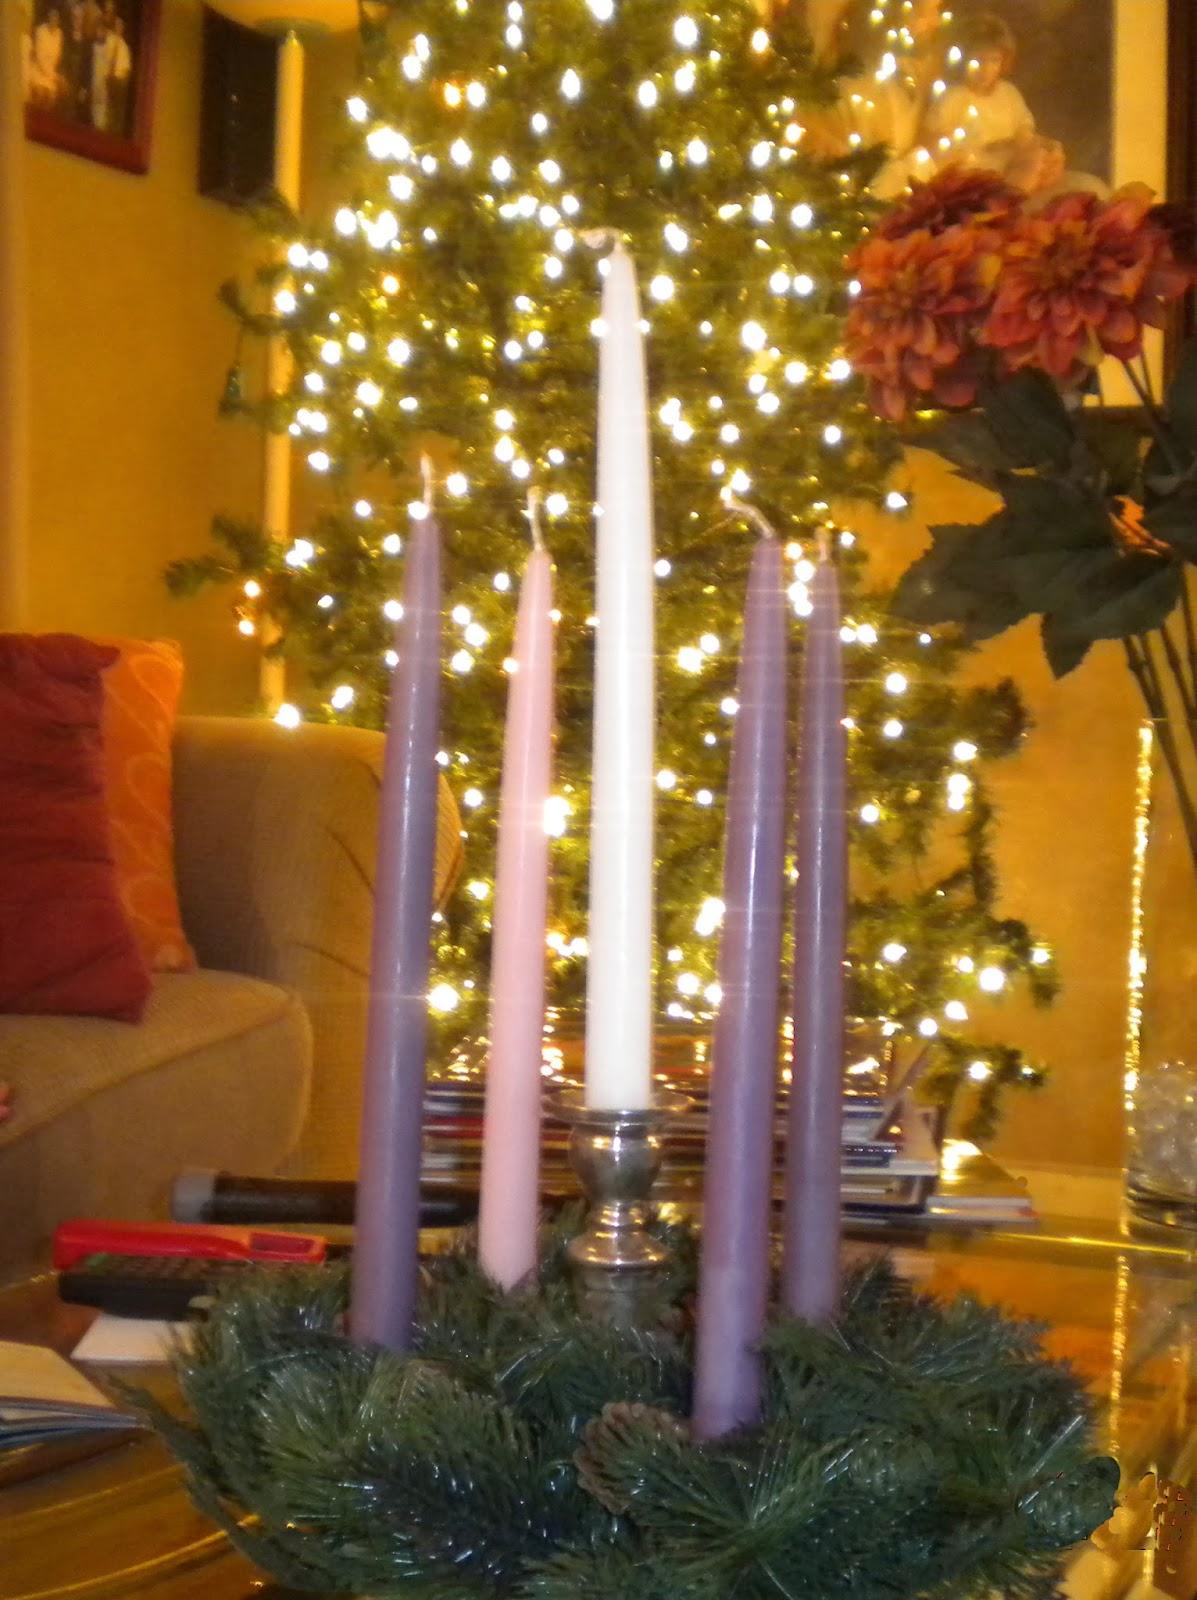 lds seasonal materials celebrating advent